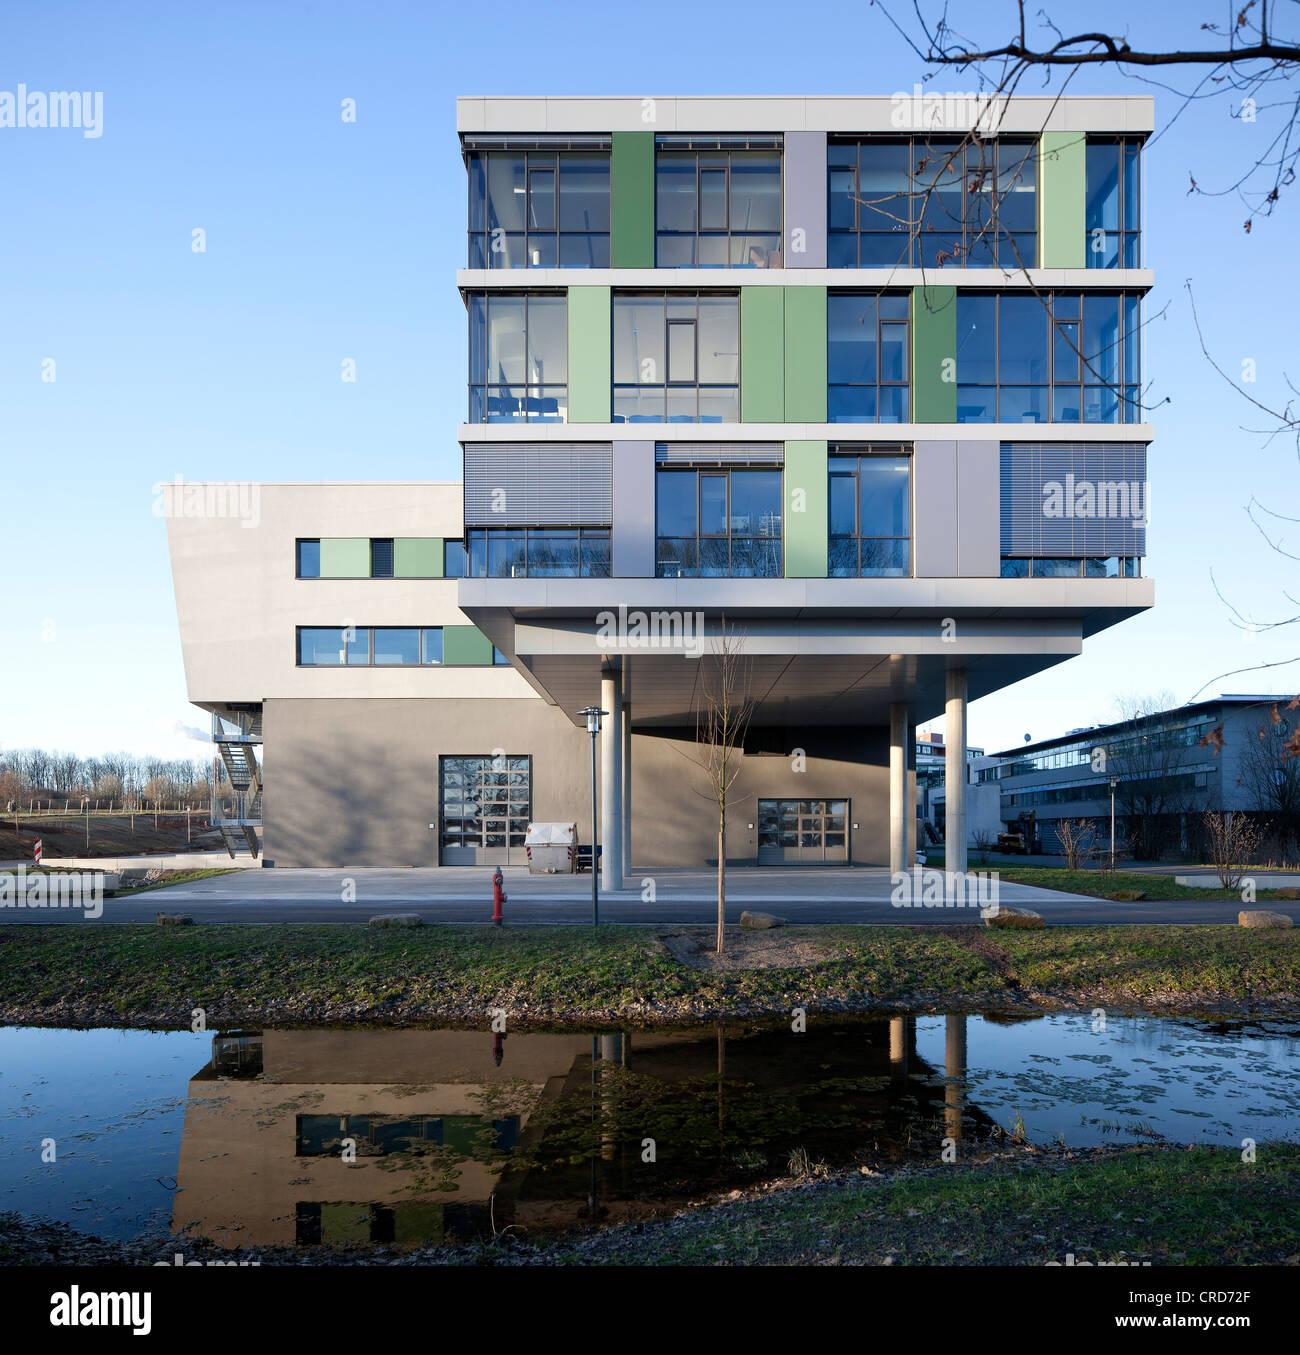 University of Applied Sciences Gelsenkirchen, extension, Gelsenkirchen, Ruhr Area, North Rhine-Westphalia, PublicGround - Stock Image